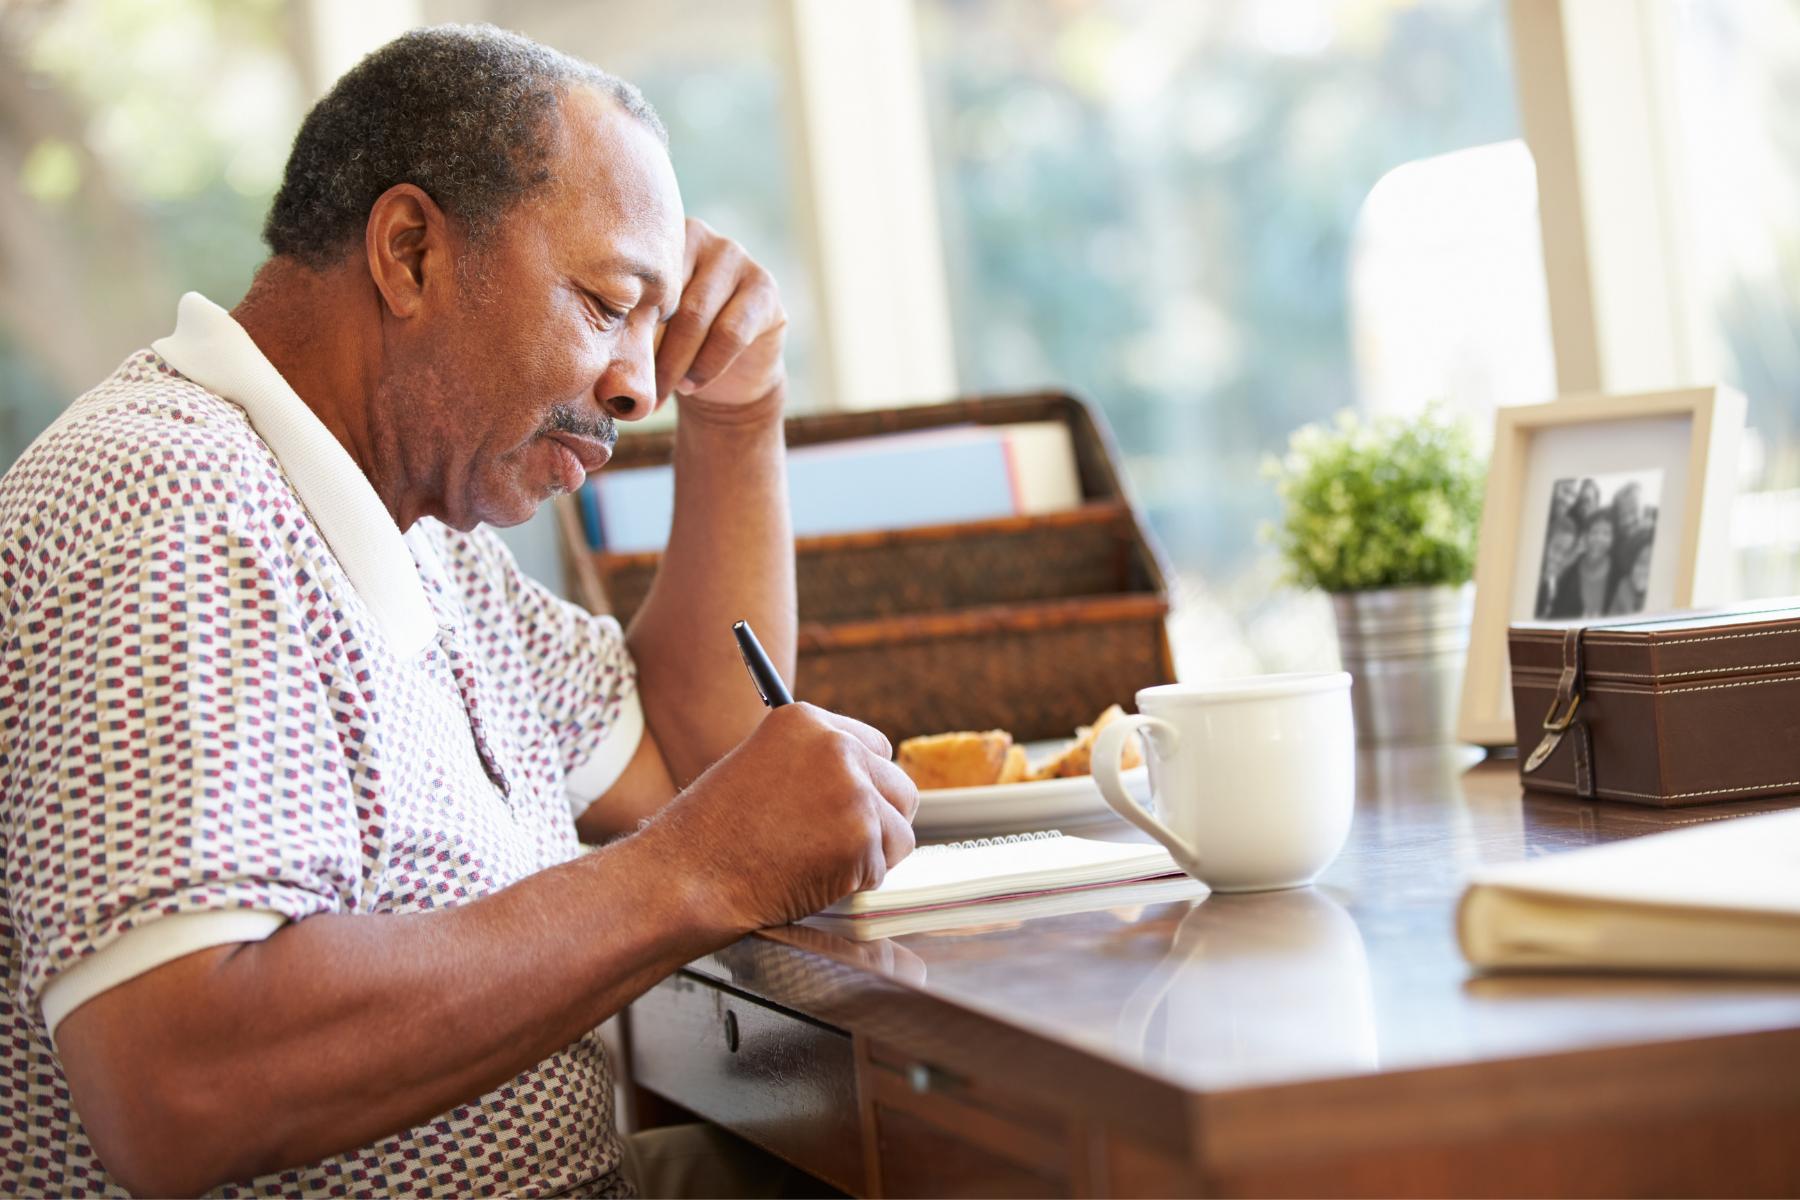 9 Reasons For Seniors To Write More